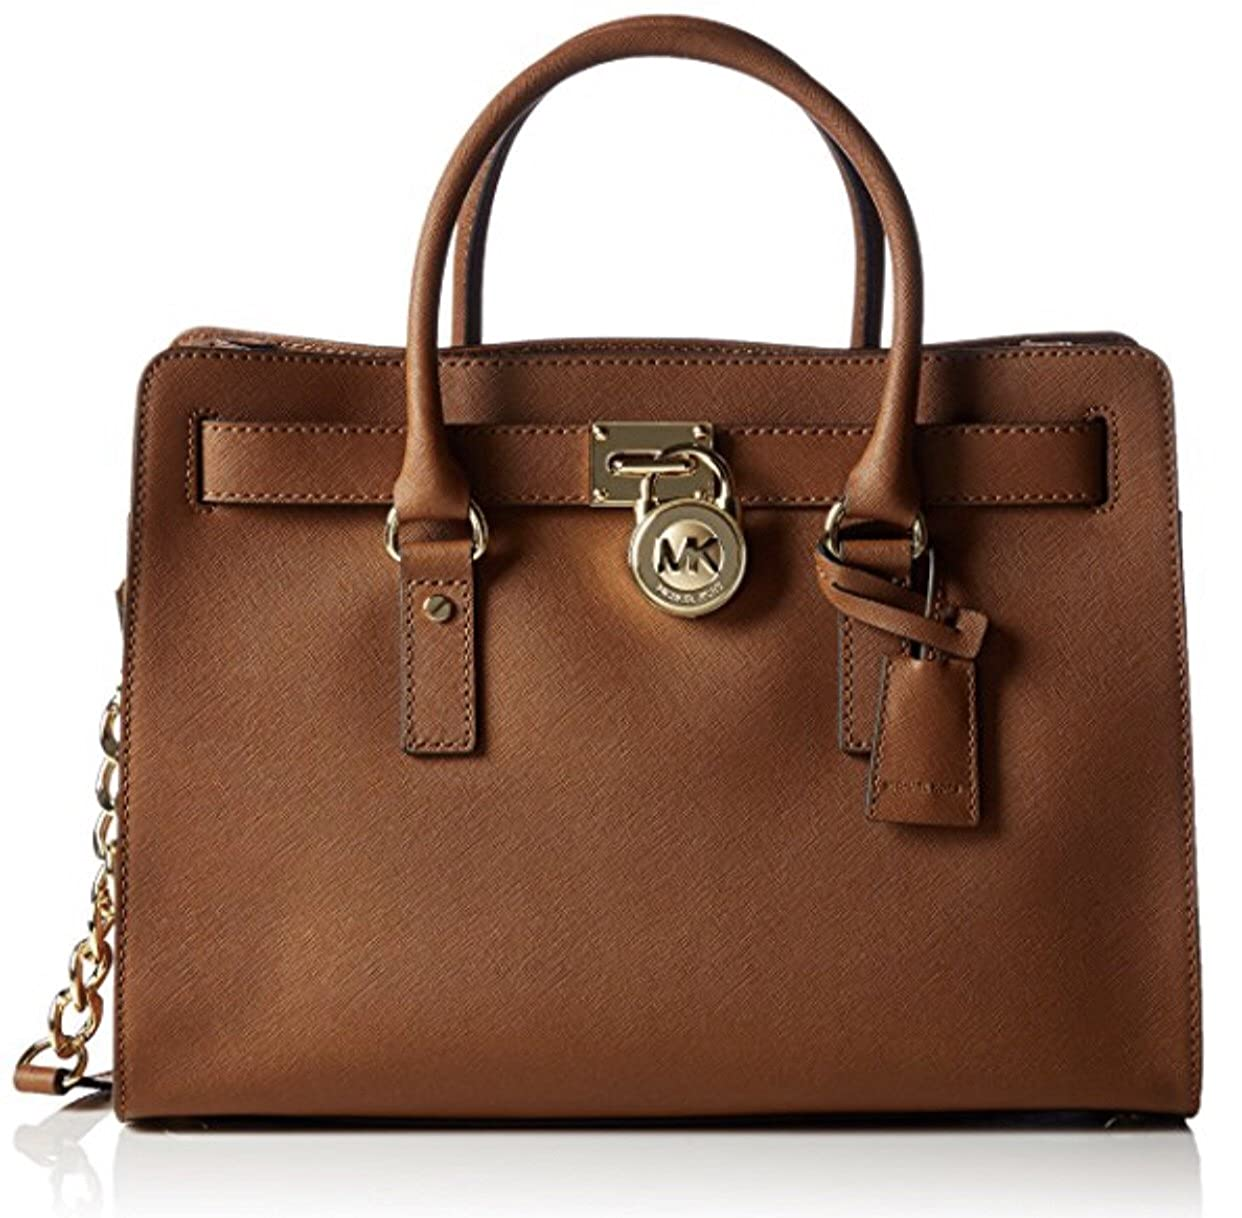 7a6b9c978588d1 MICHAEL Michael Kors Hamilton Large East West Satchel Lugggage: Handbags:  Amazon.com